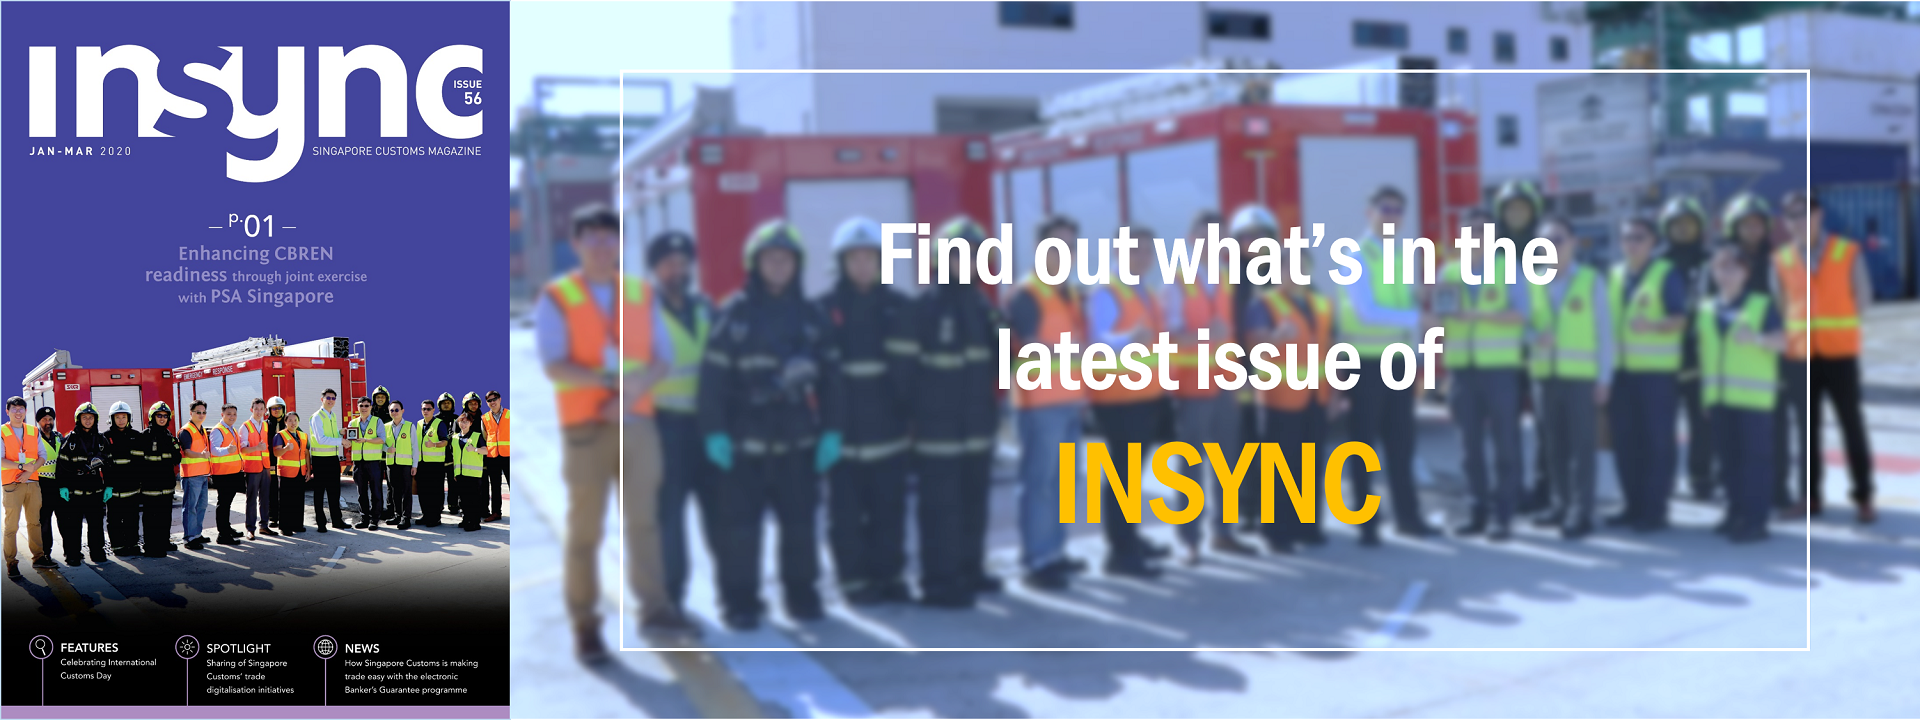 inSYNC Issue 56